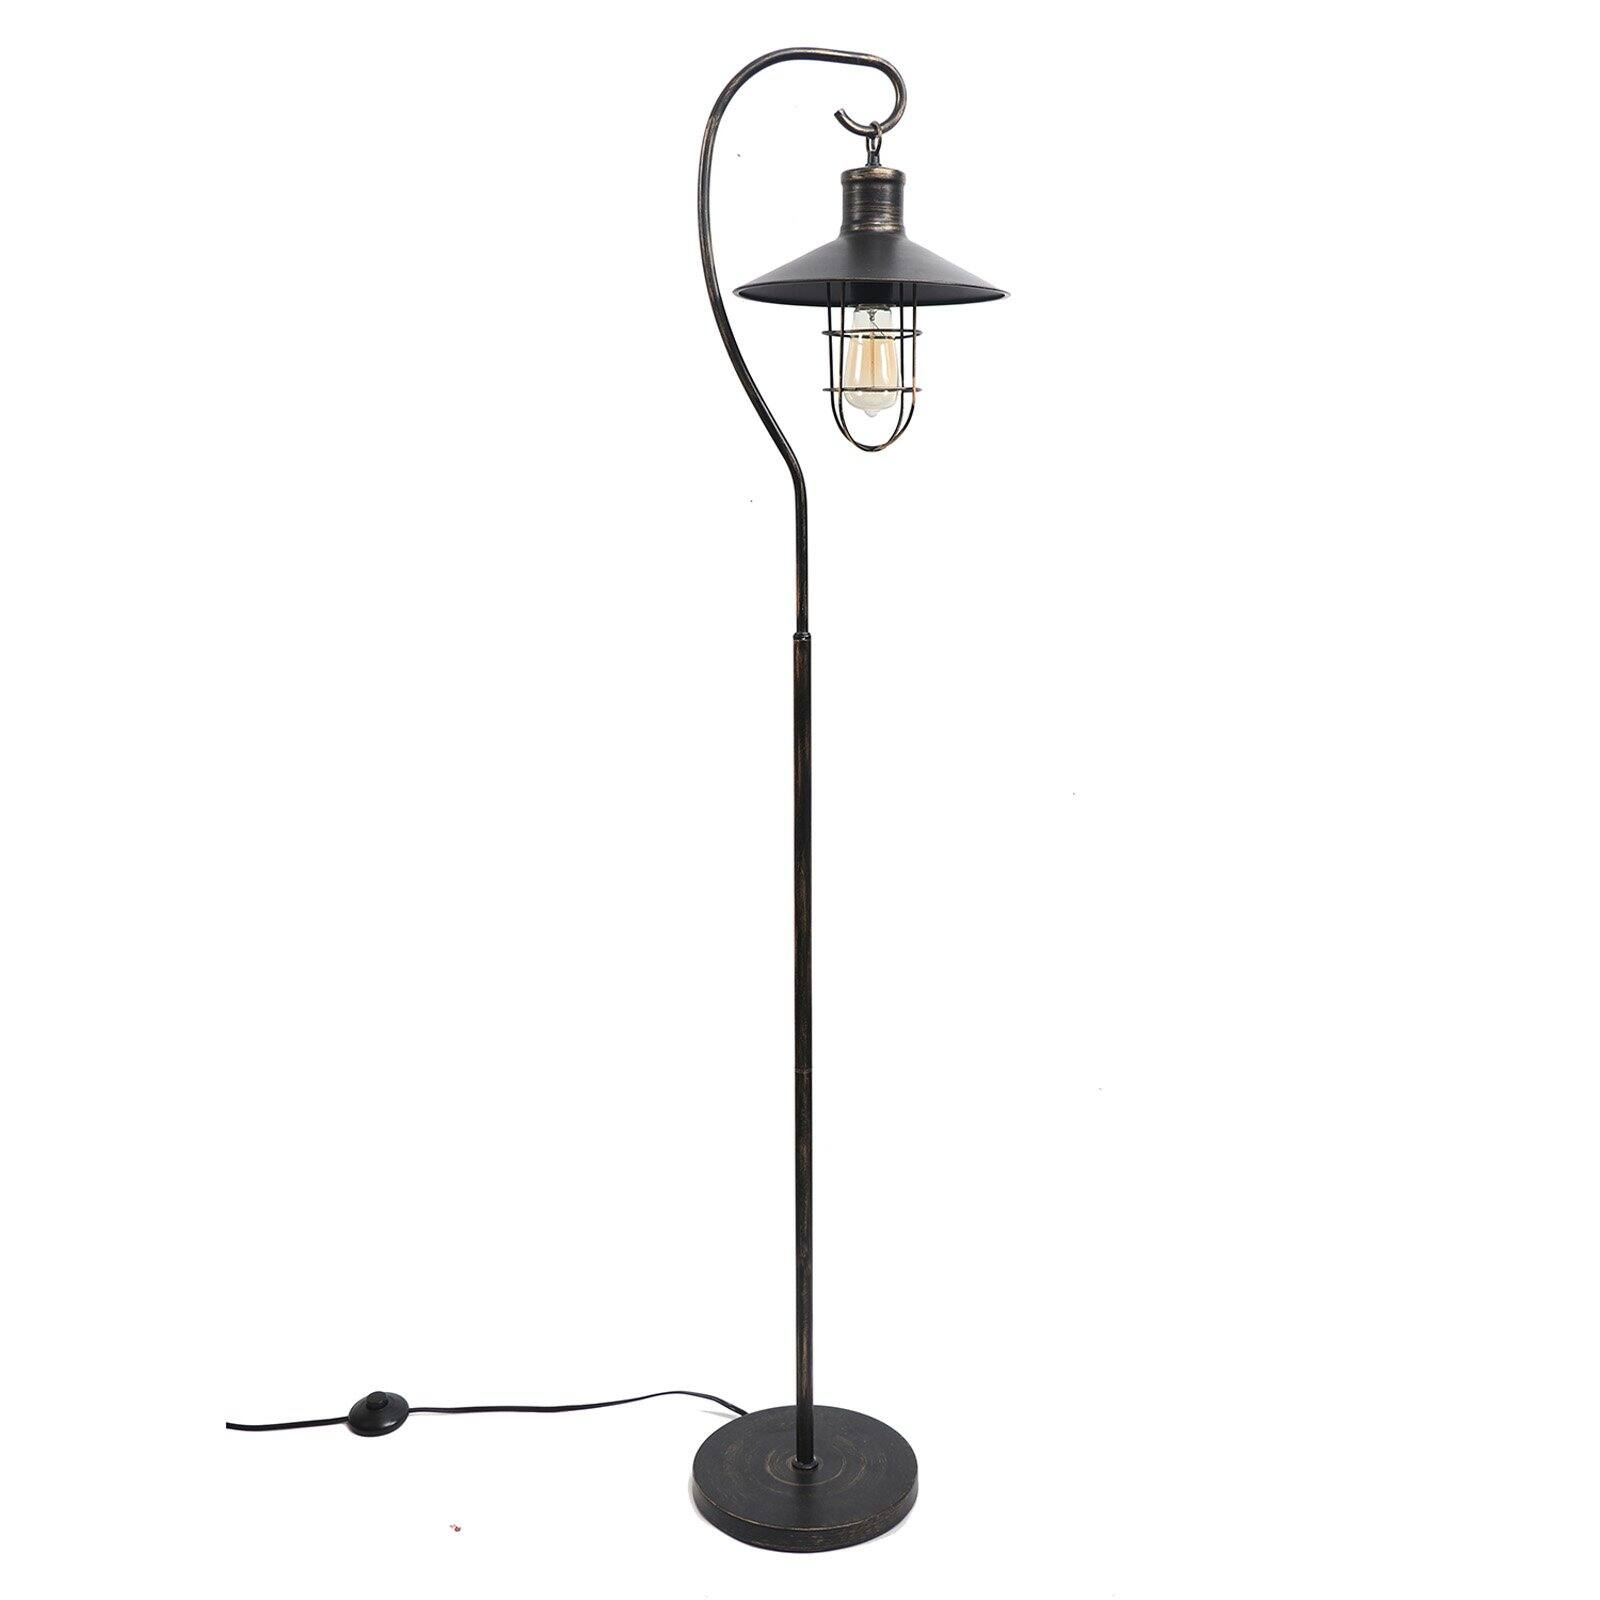 Dennis East International Standing Lantern Floor Lamp Walmart Com Walmart Com